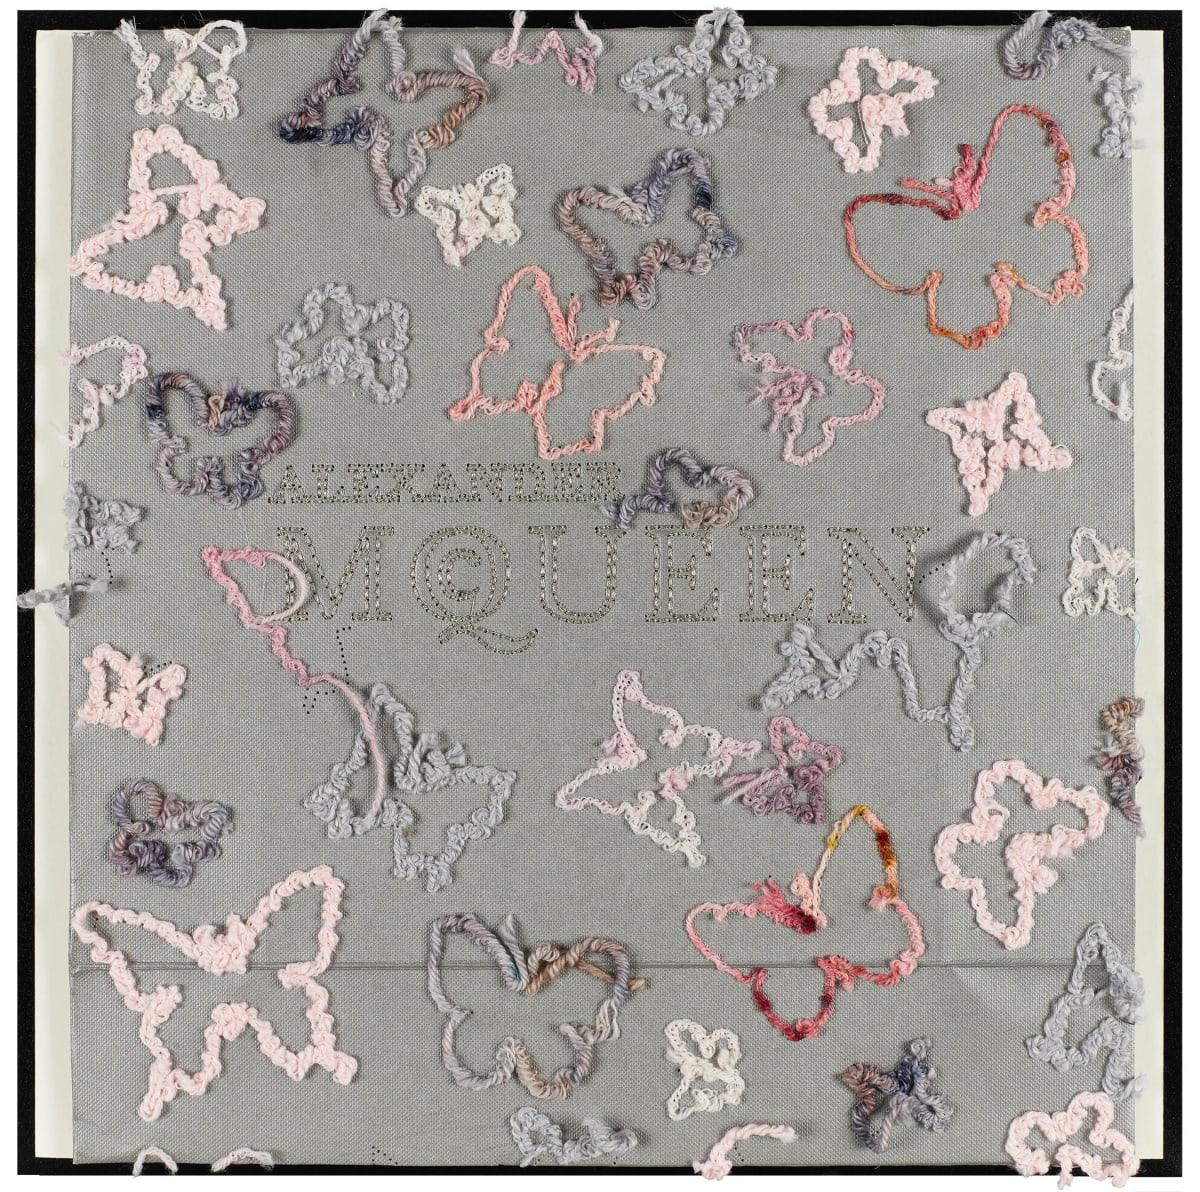 Stephen Wilson, McQueen Flutter (Pink), 2019